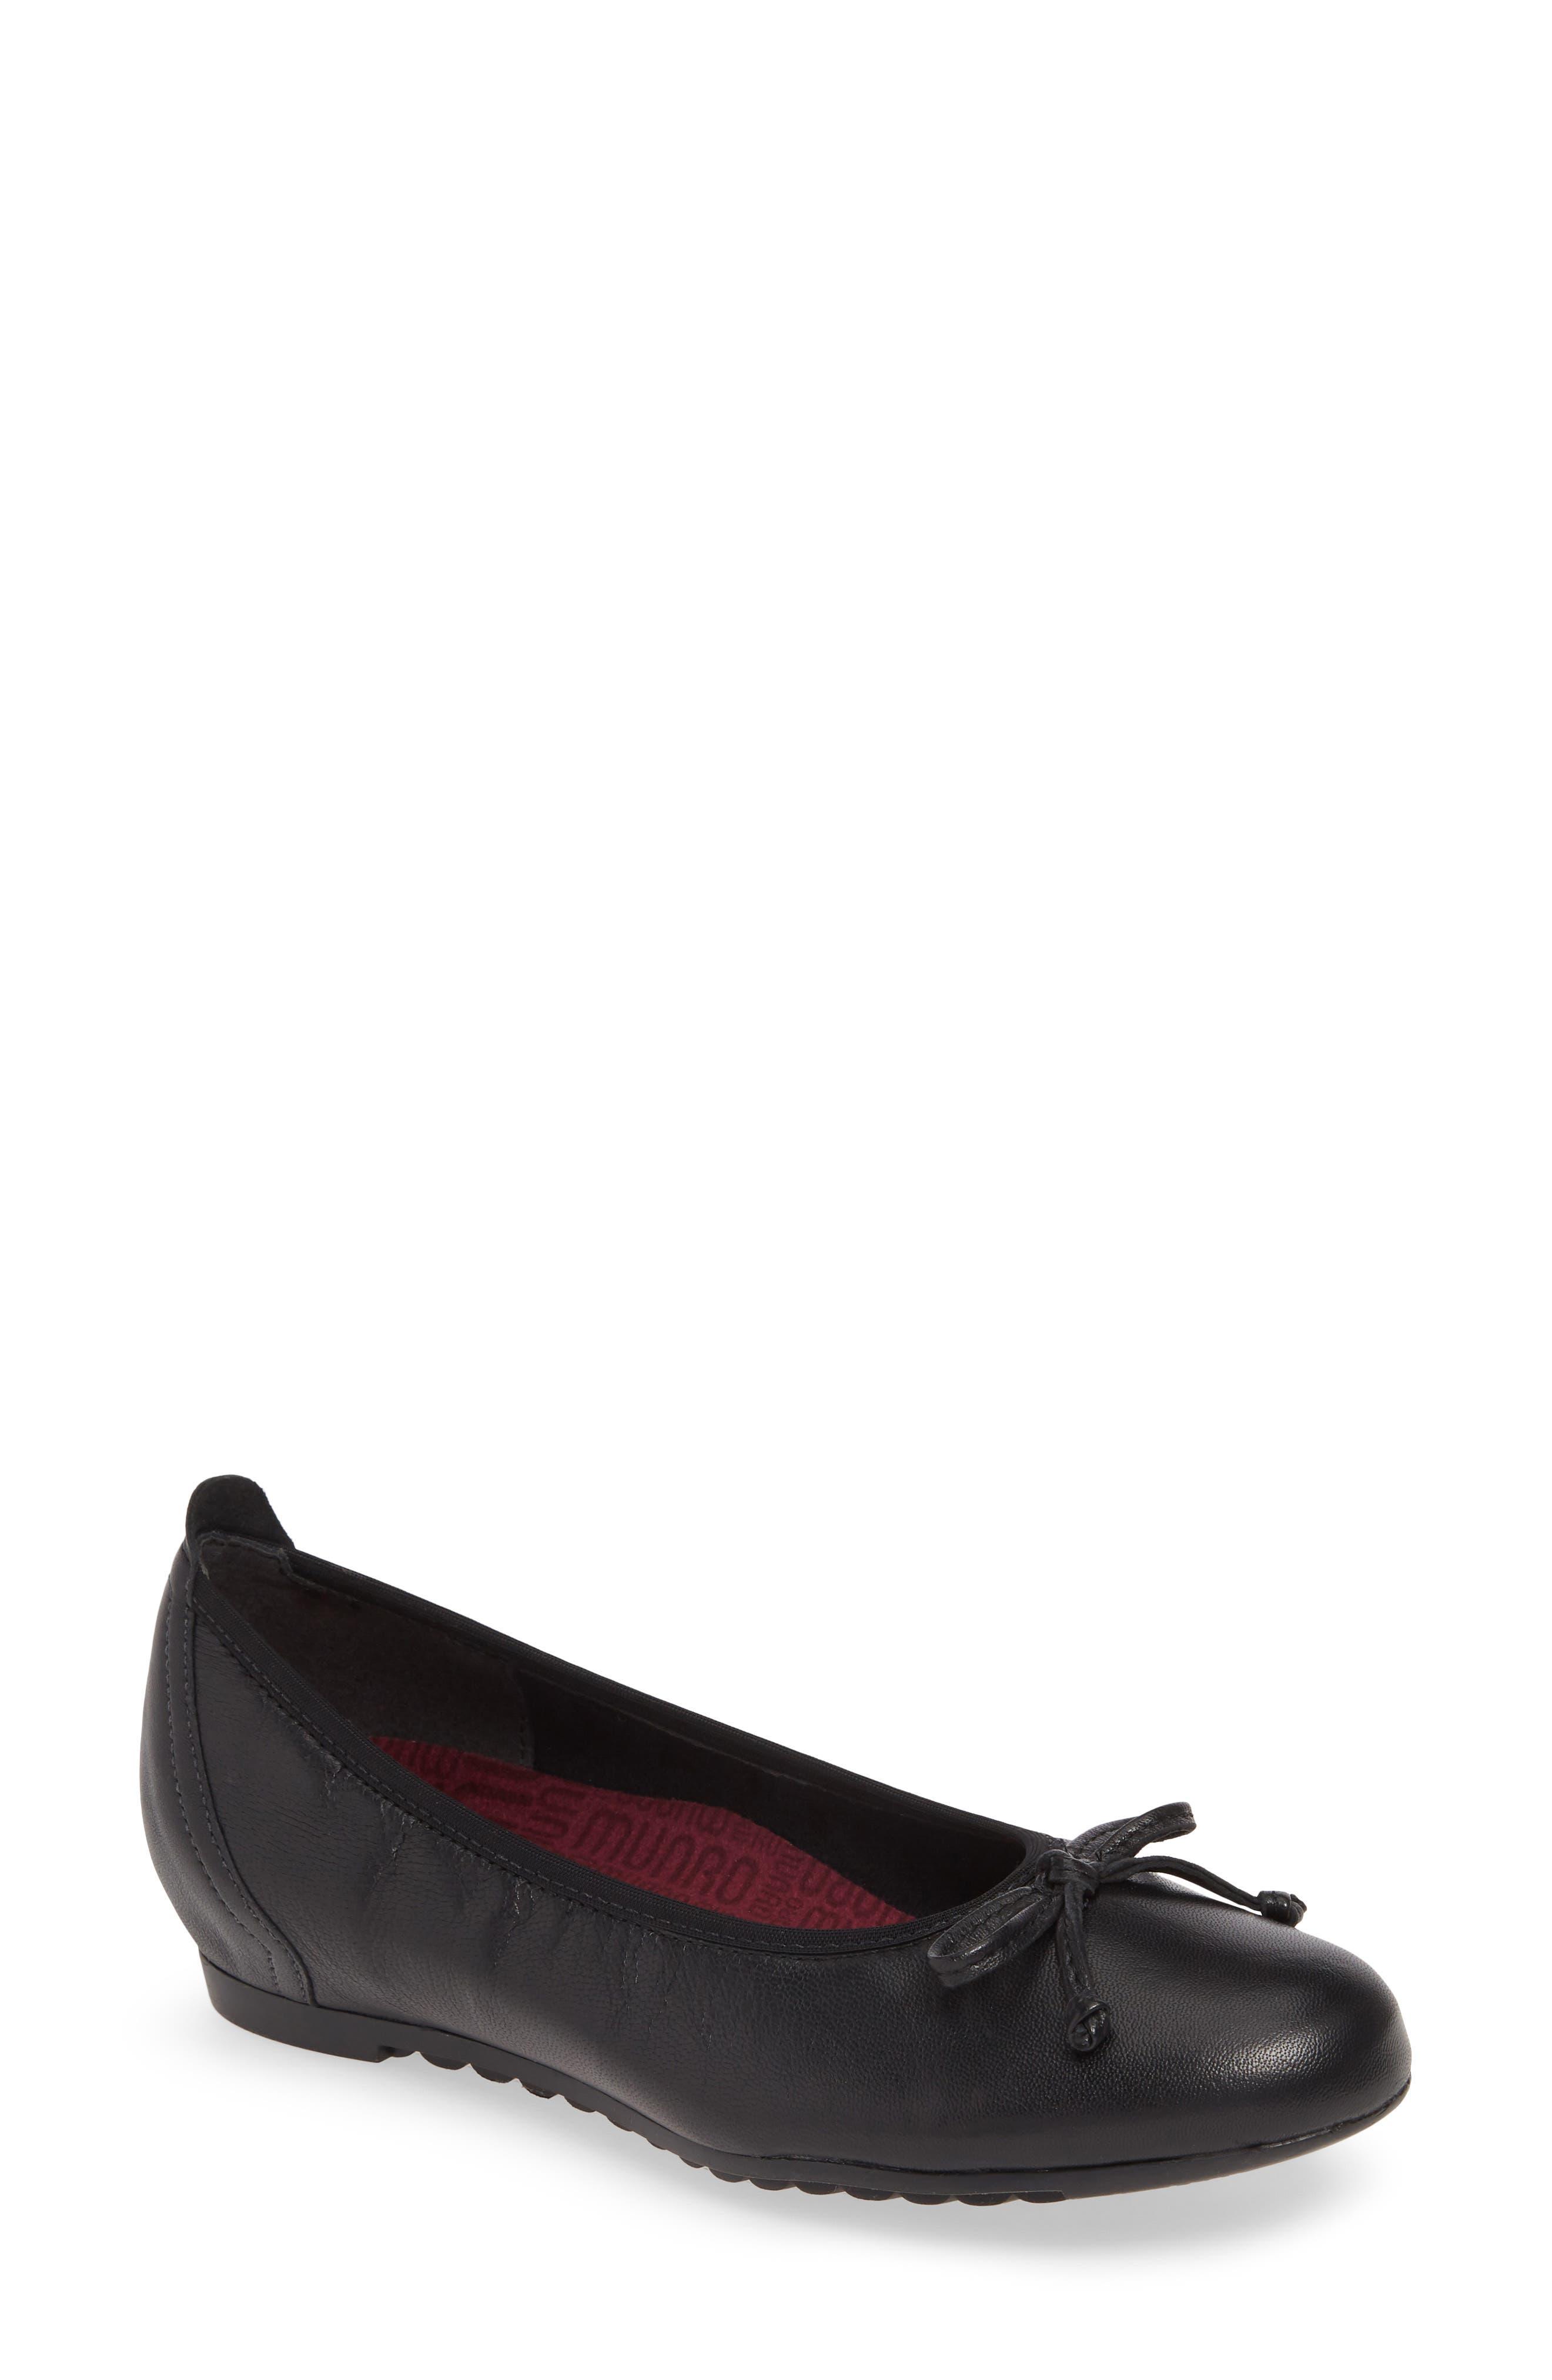 Munro Quinn Ballet Flat, Black